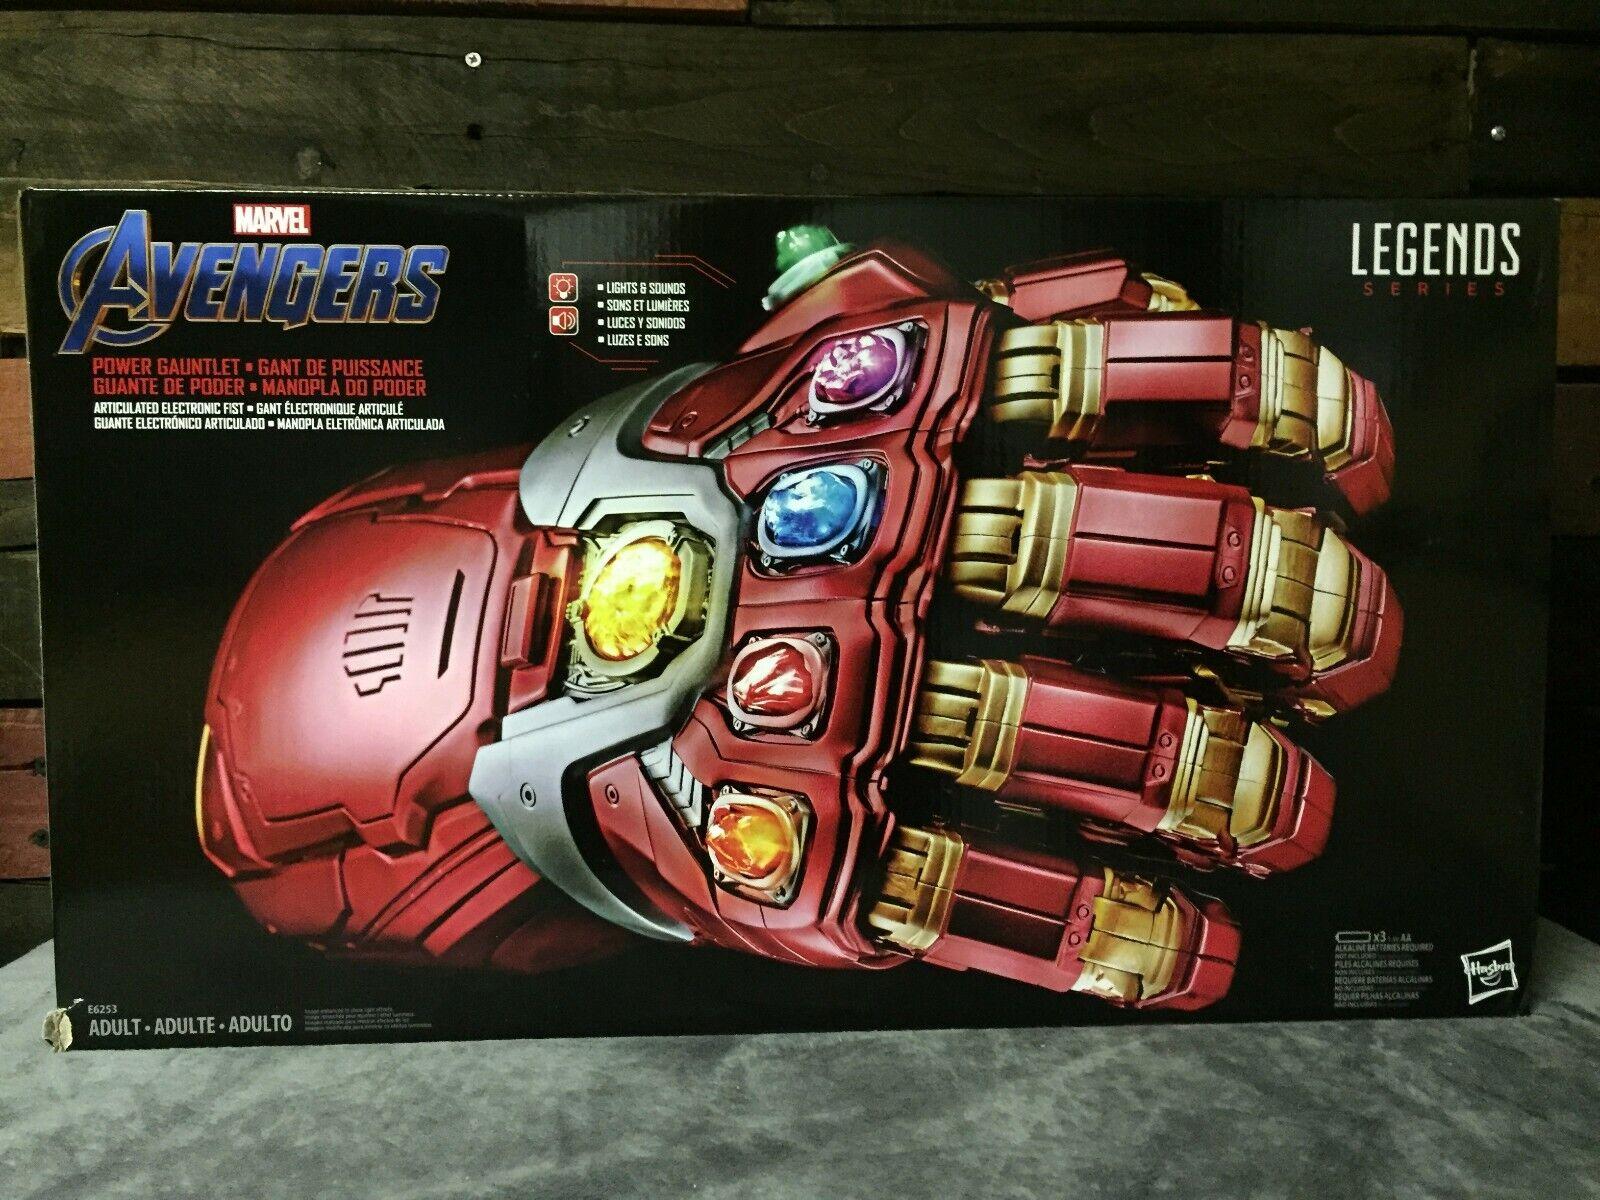 Marvel leggende SERIE AVENGERS mossa finale Adulto Replica energia Gauntlet IRON uomo